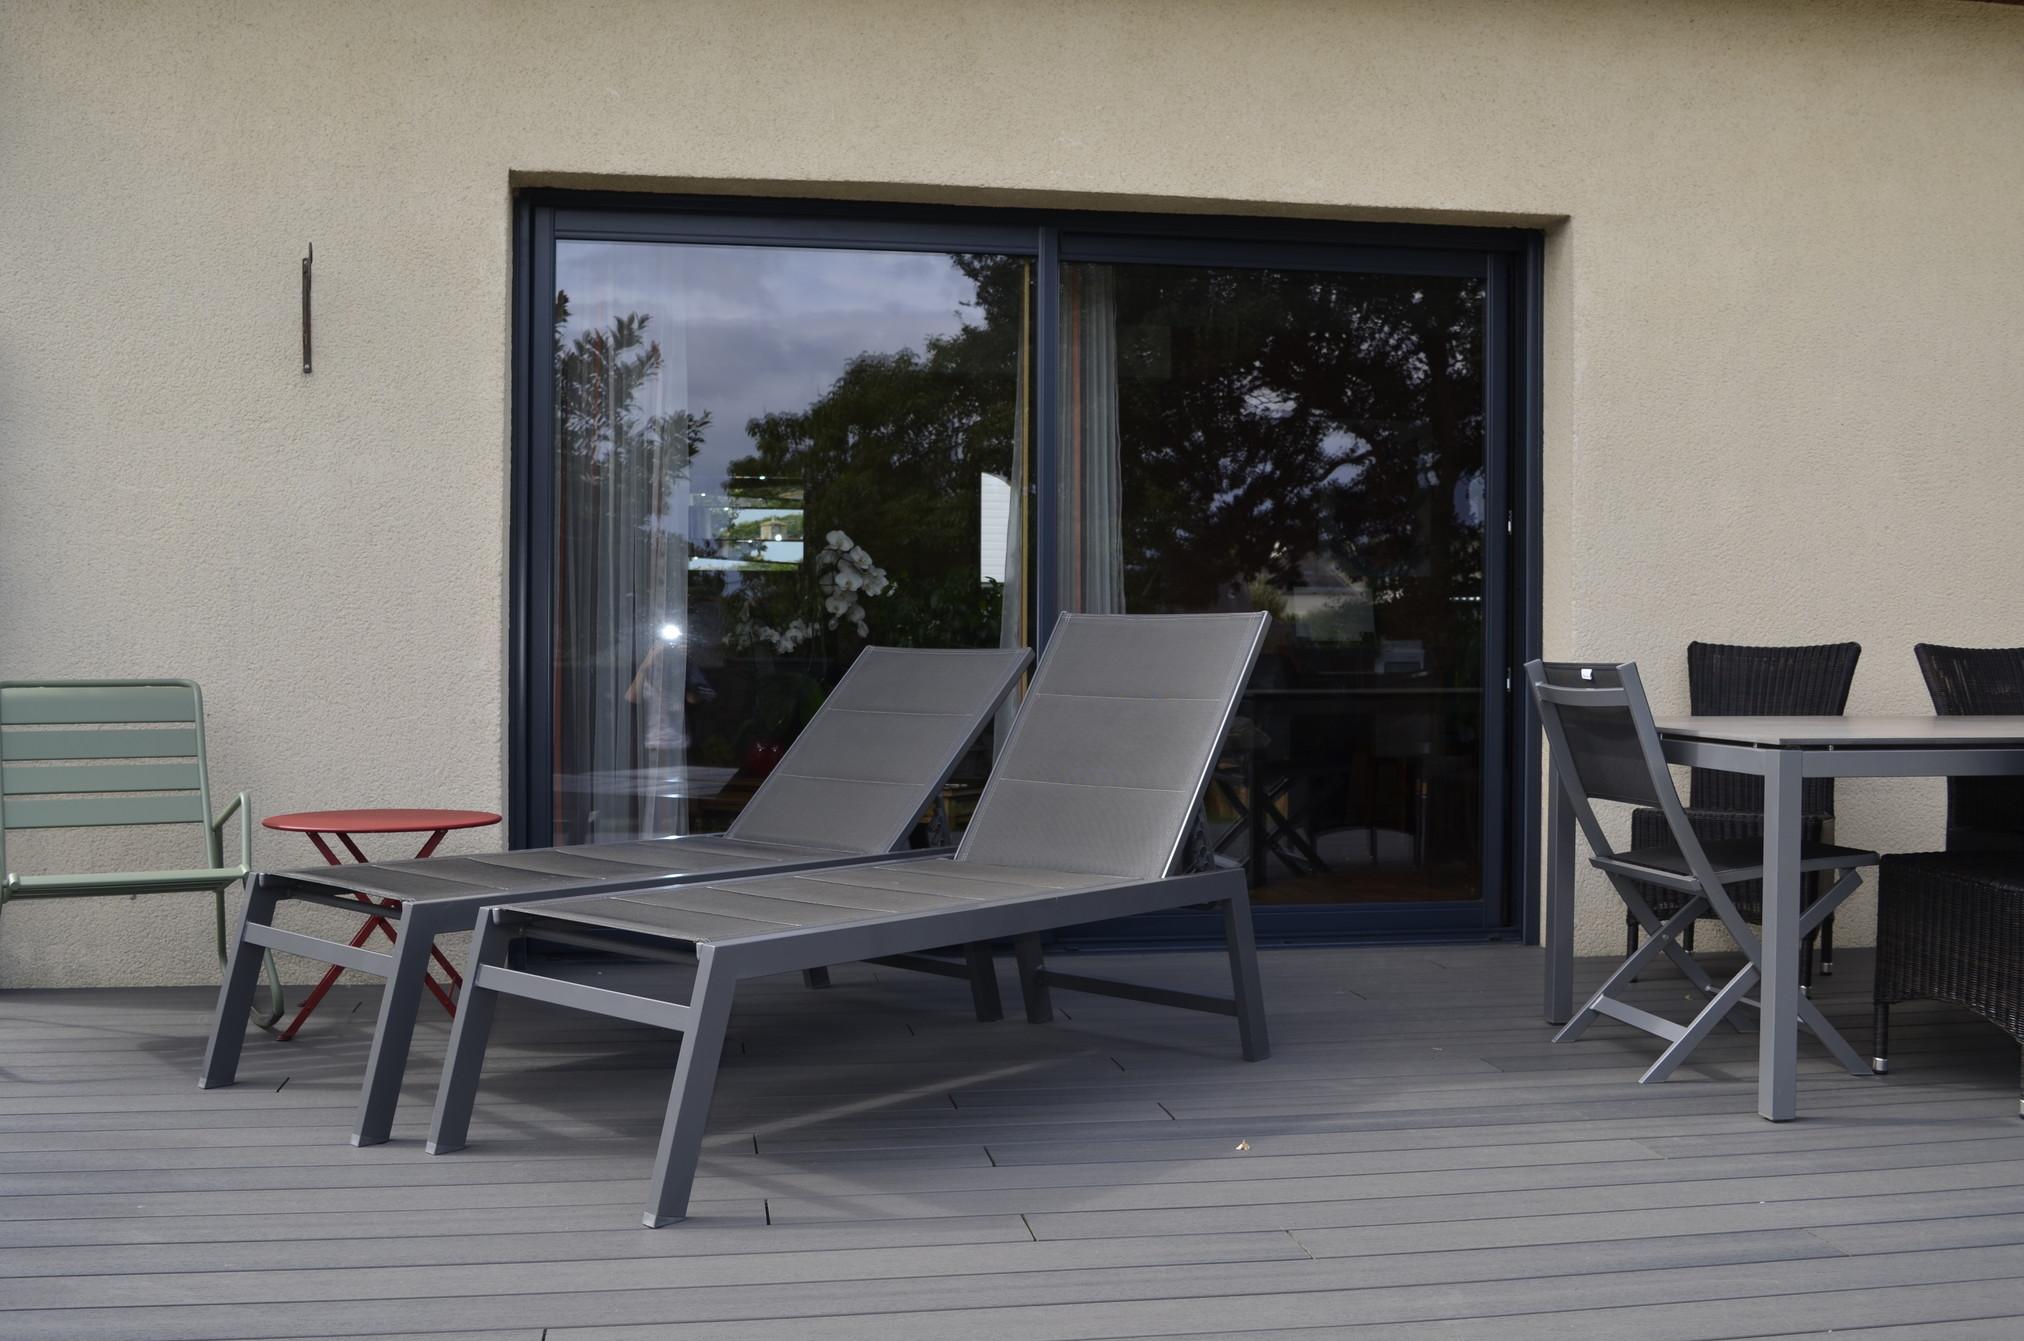 baie vitr e mixte et porte d 39 entr e alu bois maison. Black Bedroom Furniture Sets. Home Design Ideas